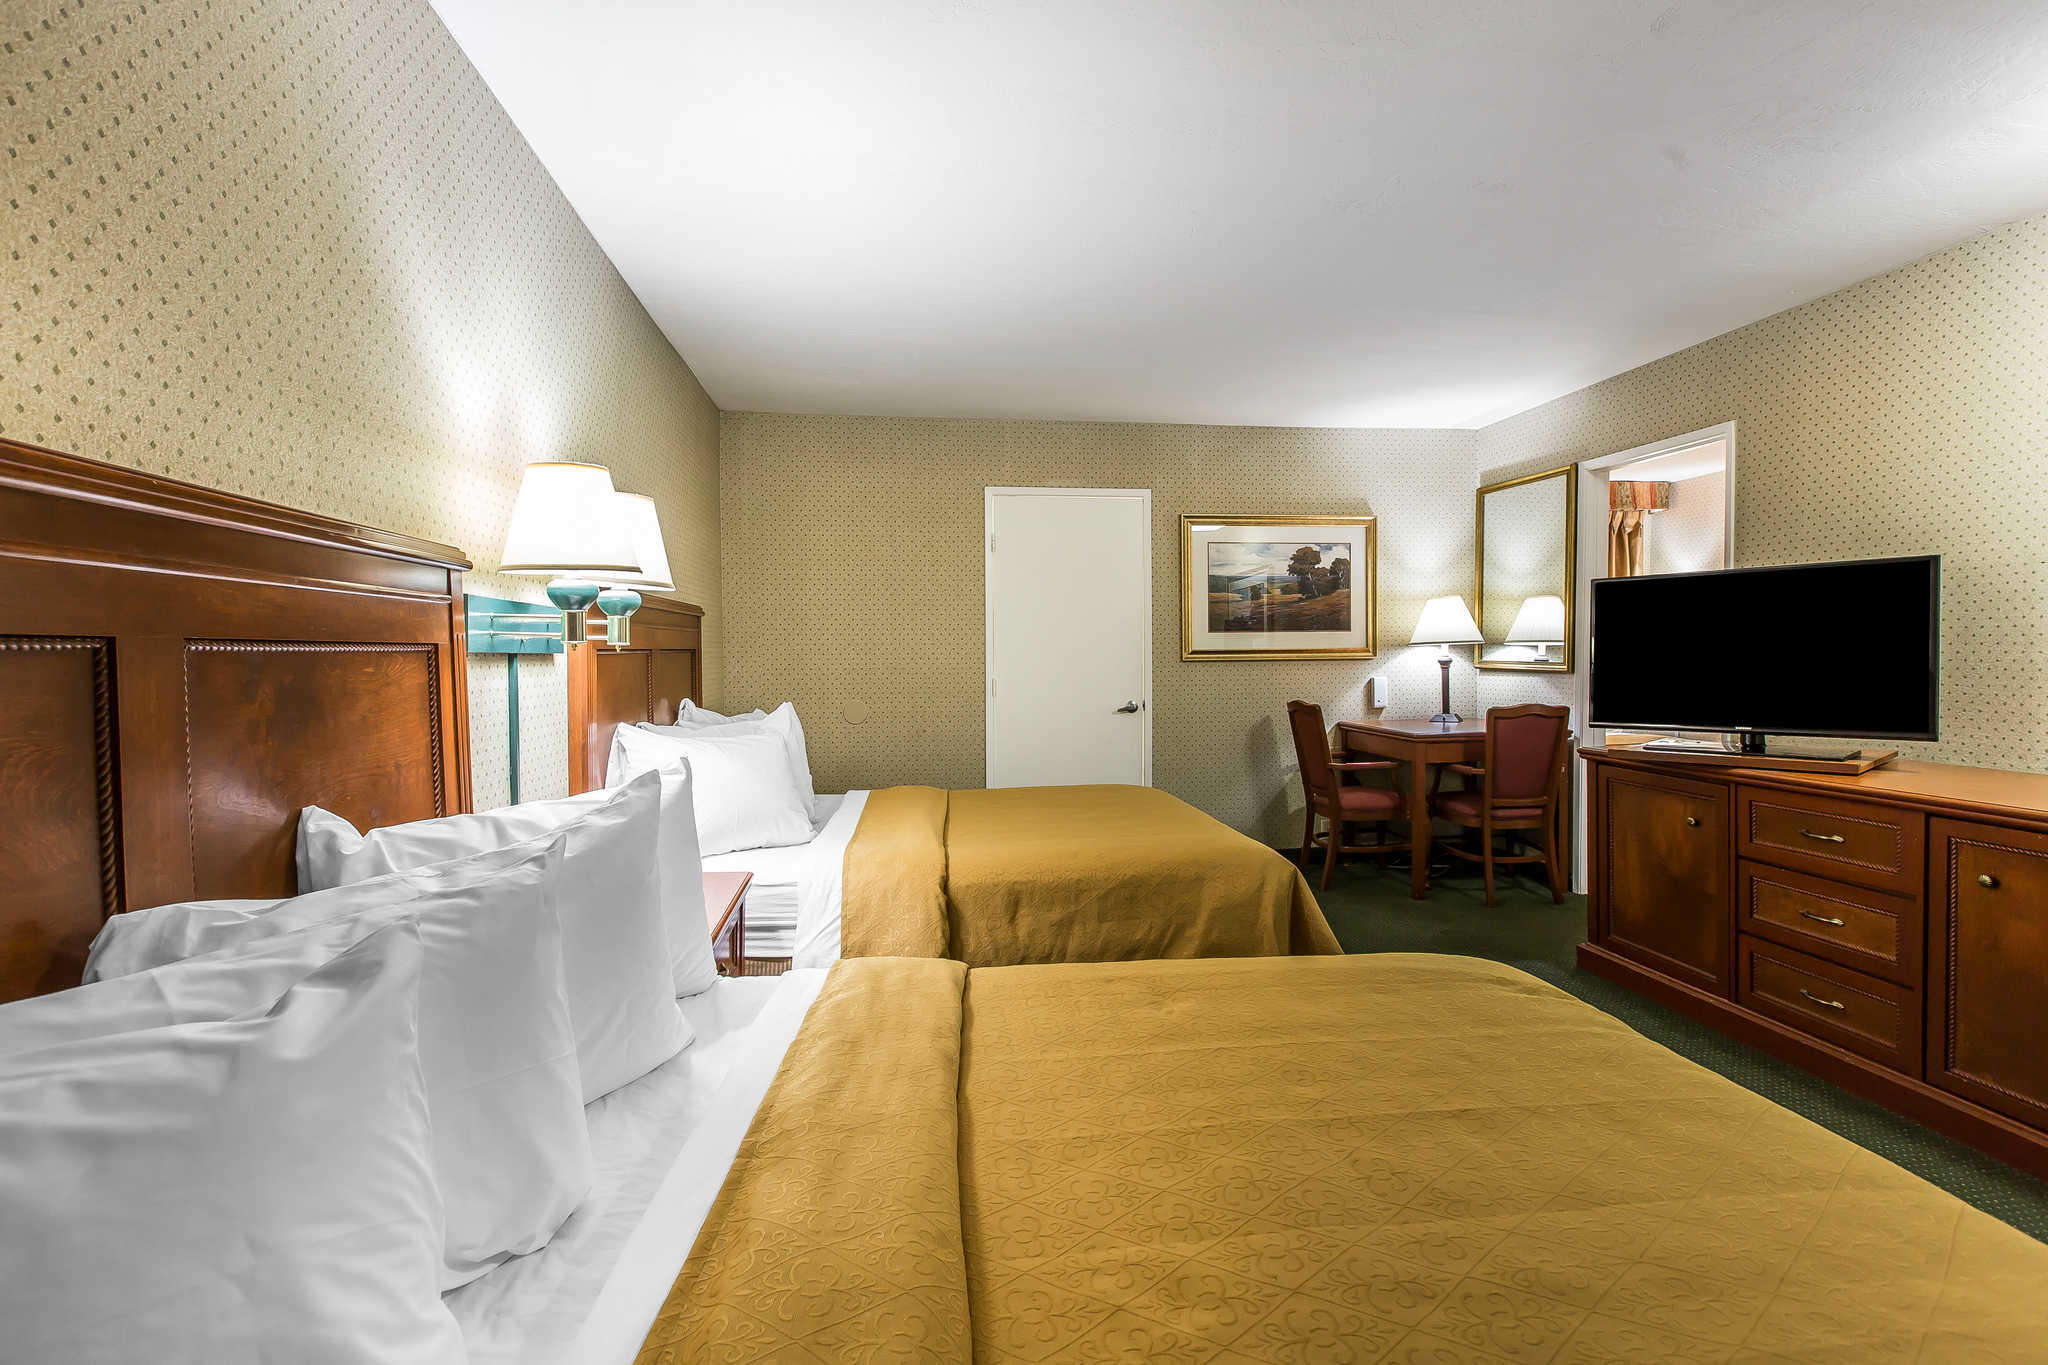 Quality Inn Near China Lake Naval Station image 25